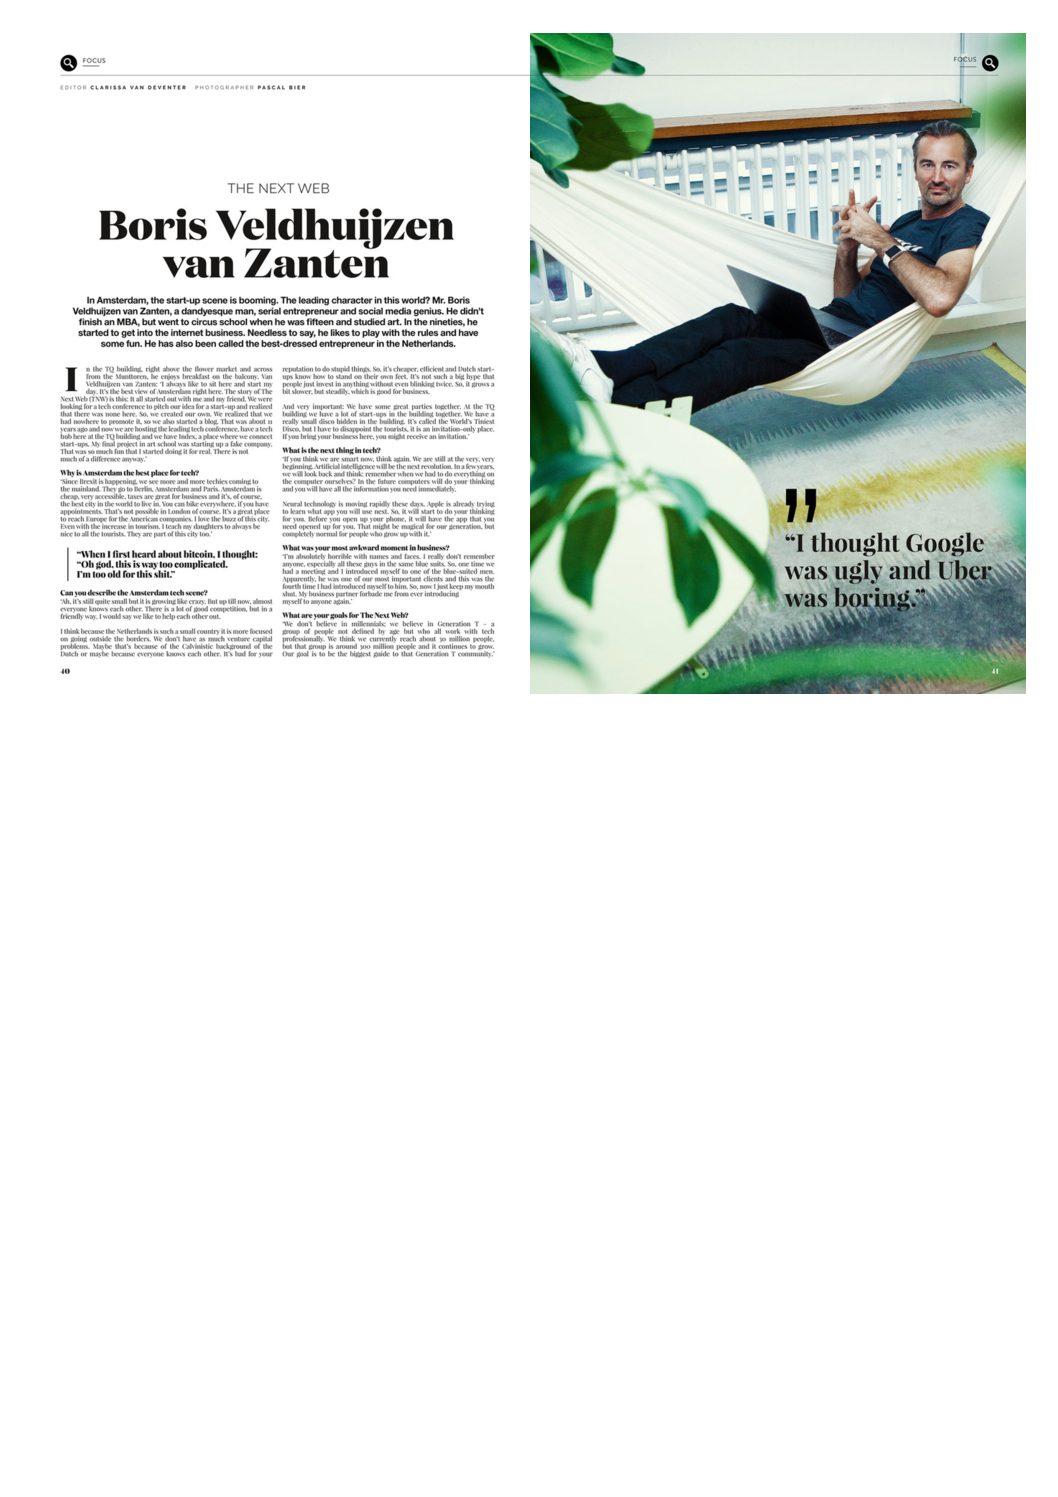 Boris Veldhuijzen van Zanten - Hello Amsterdam